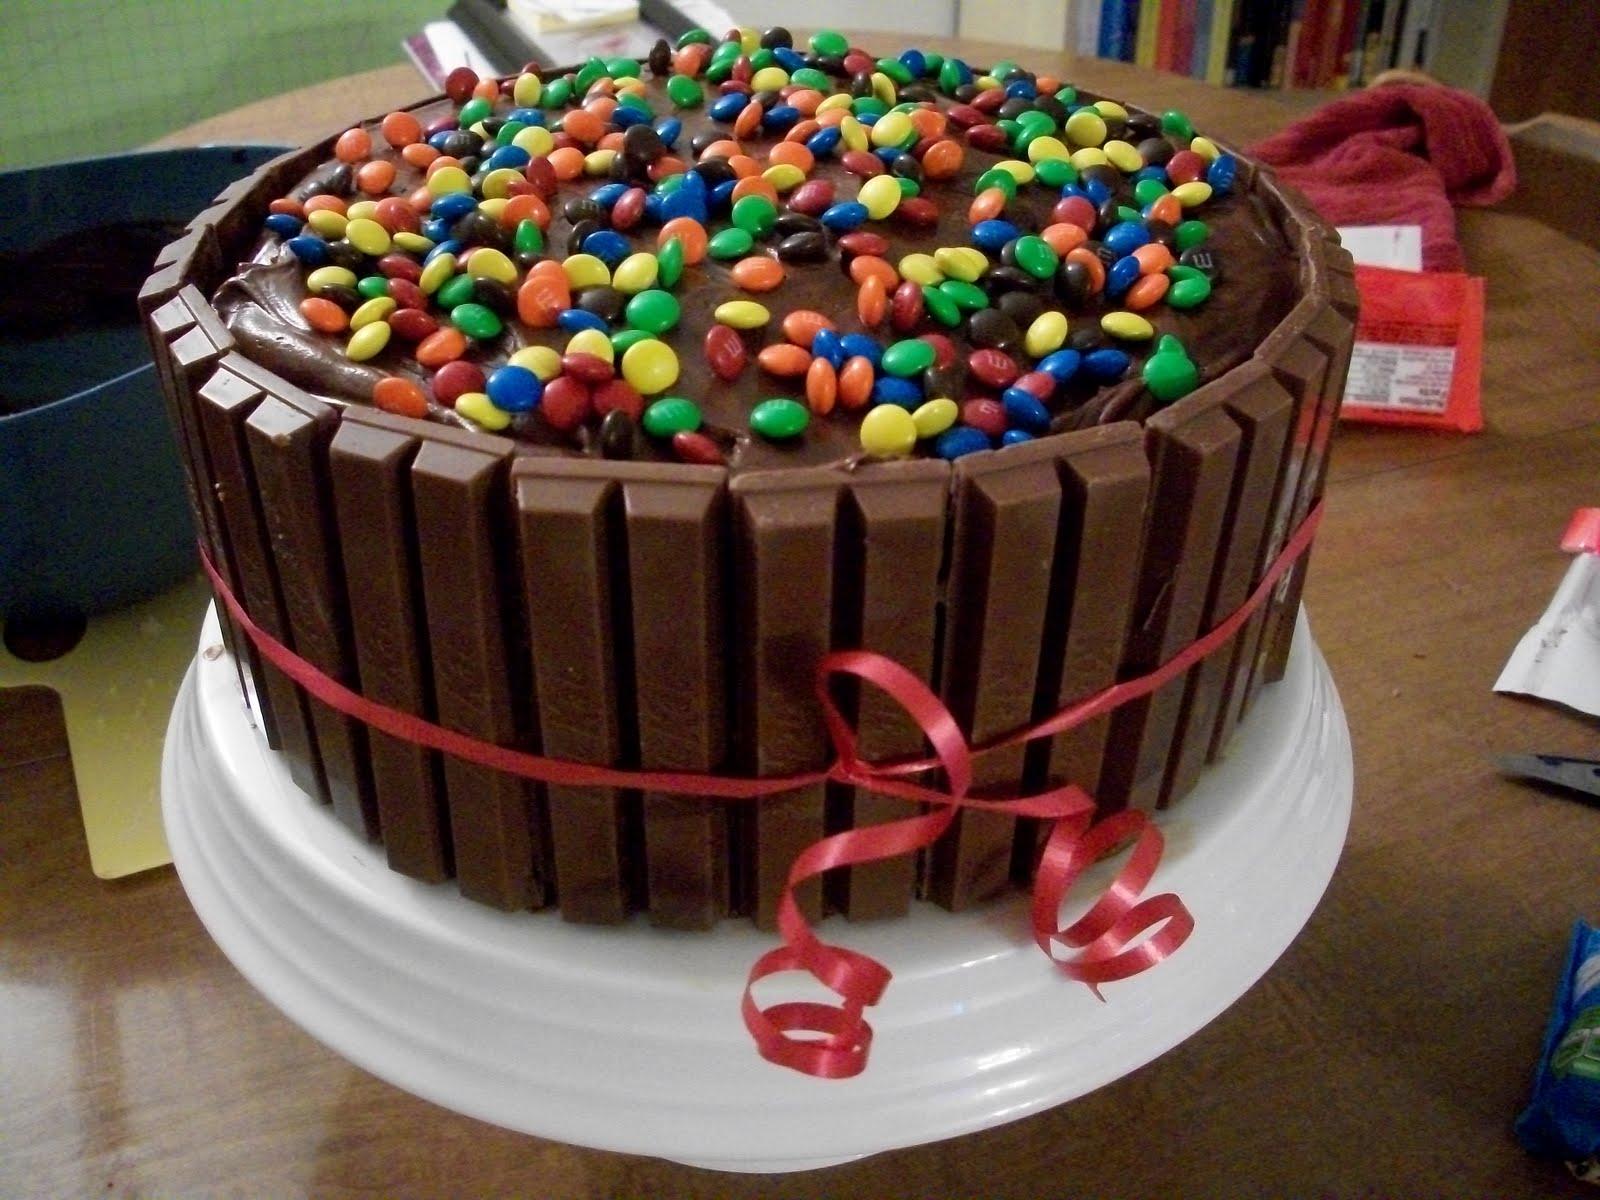 36 Birthday Cake Ideas For Men 2bpblogspot Ma6uQlDFF20 ThPD23eBXtI AAAAAAA